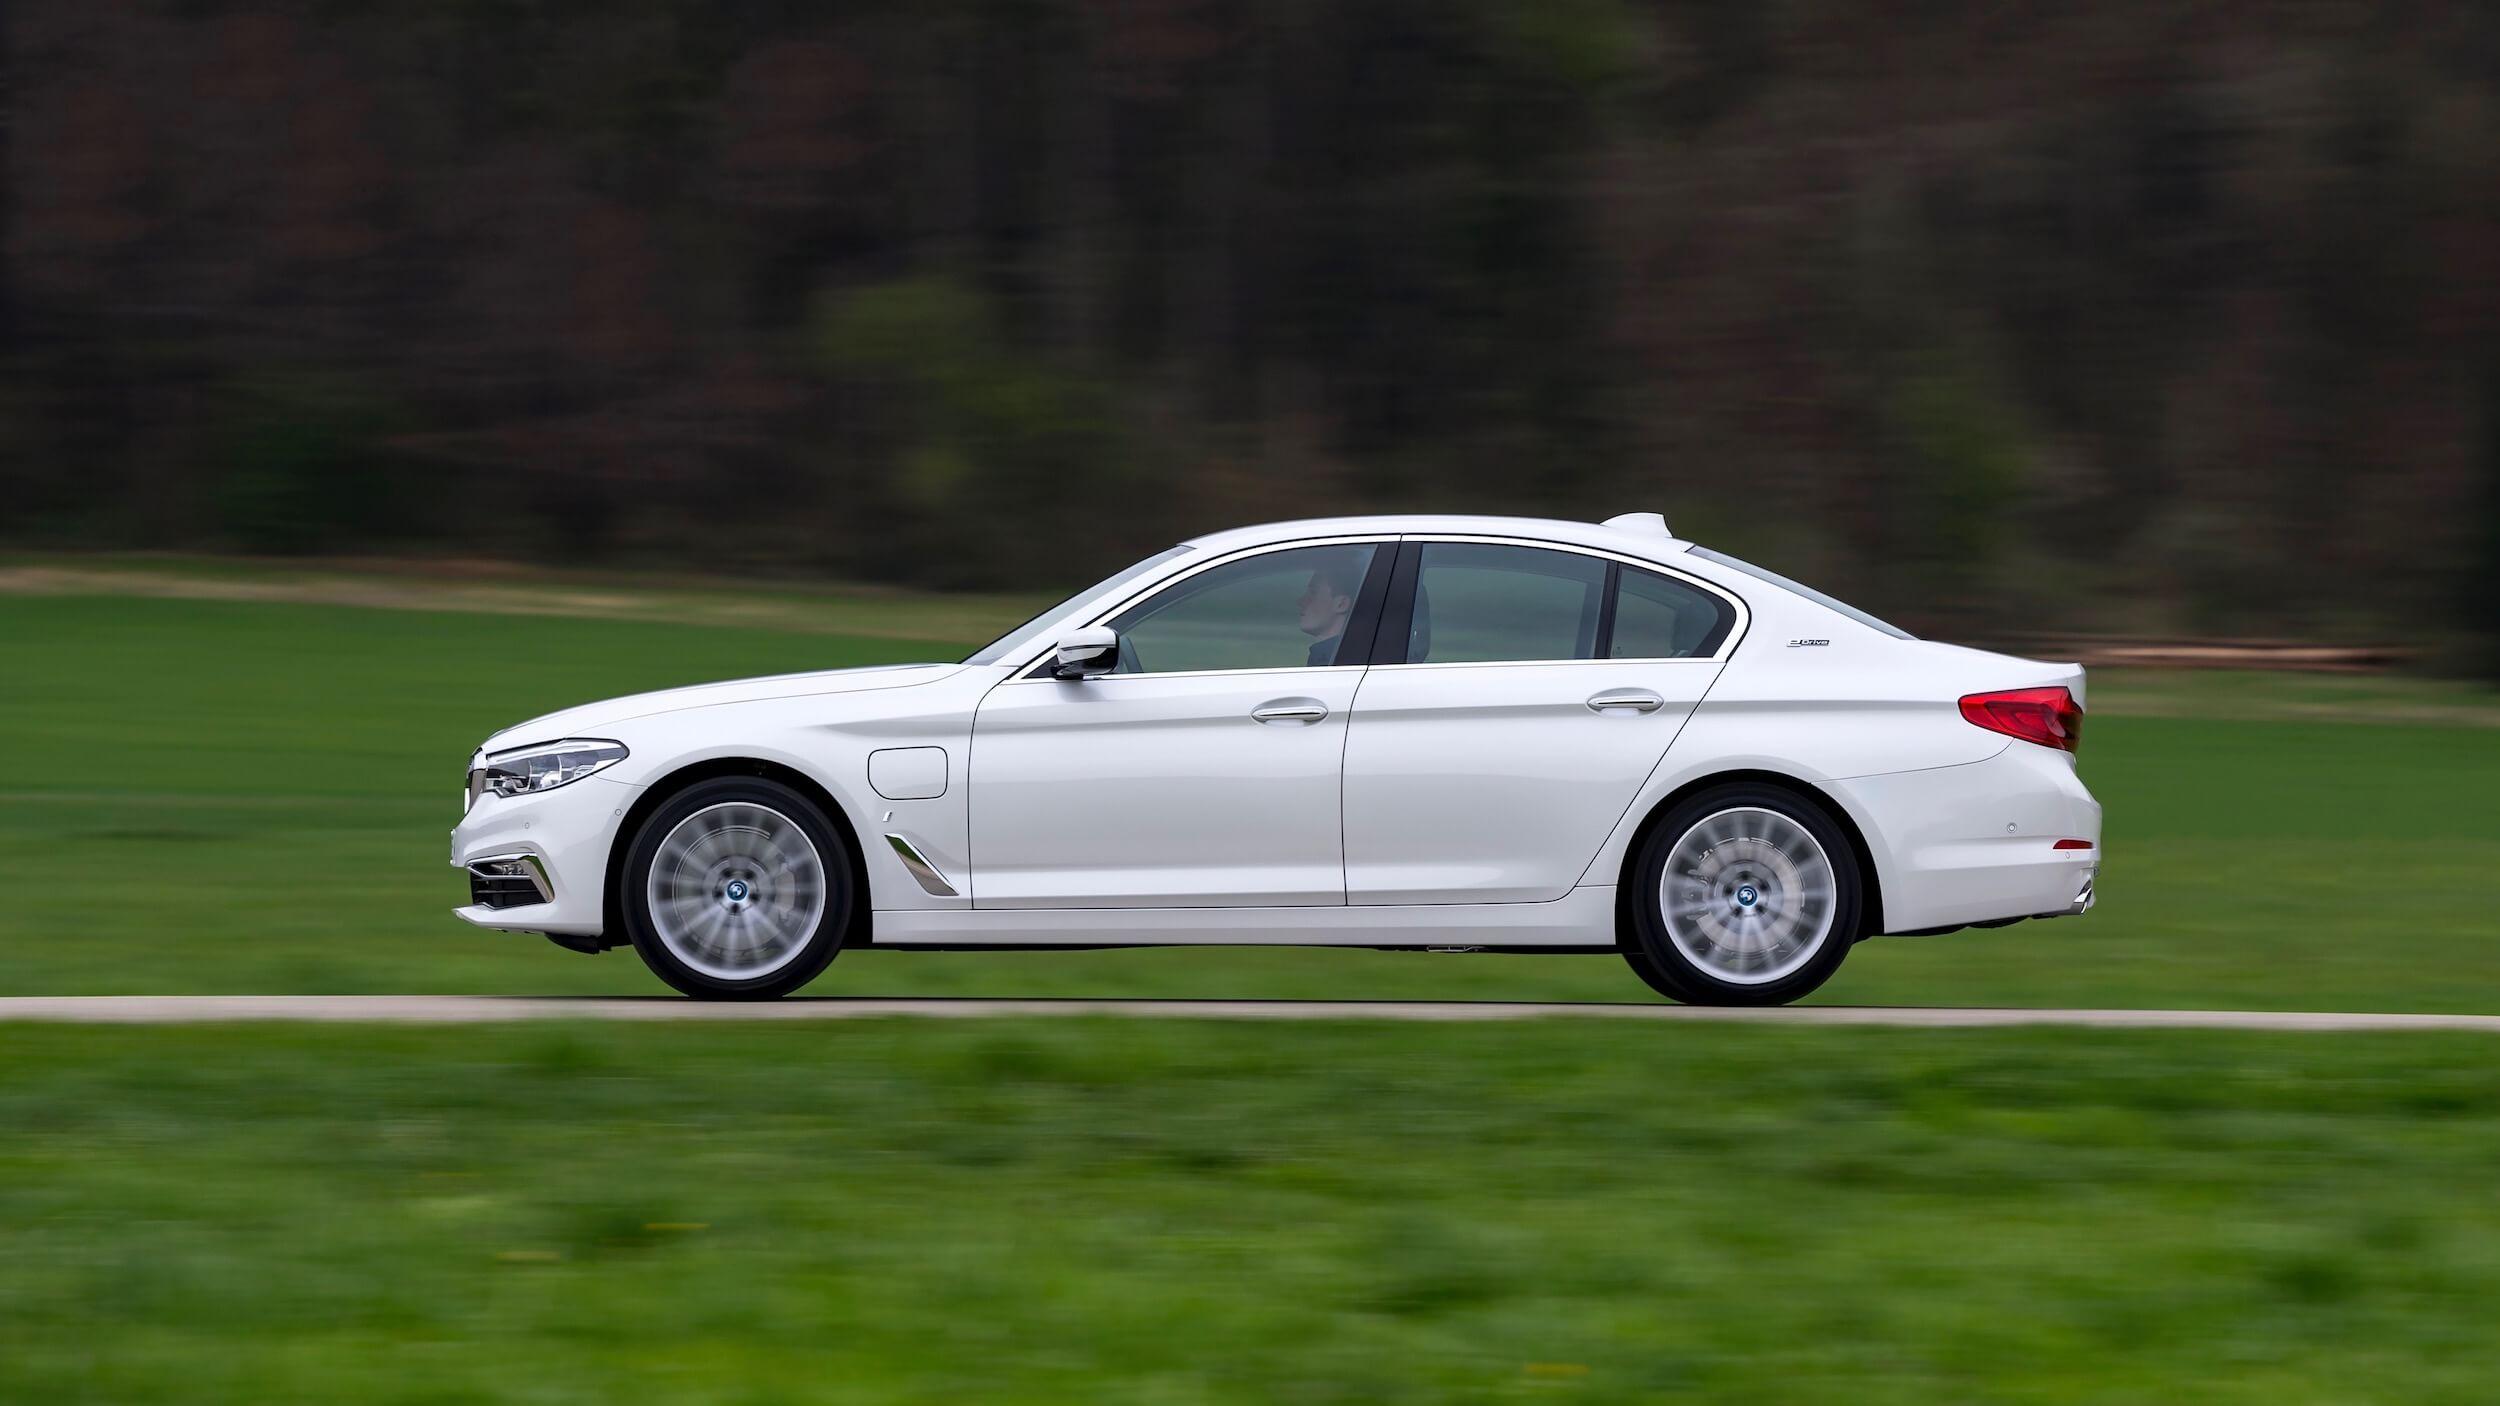 BMW 530e side